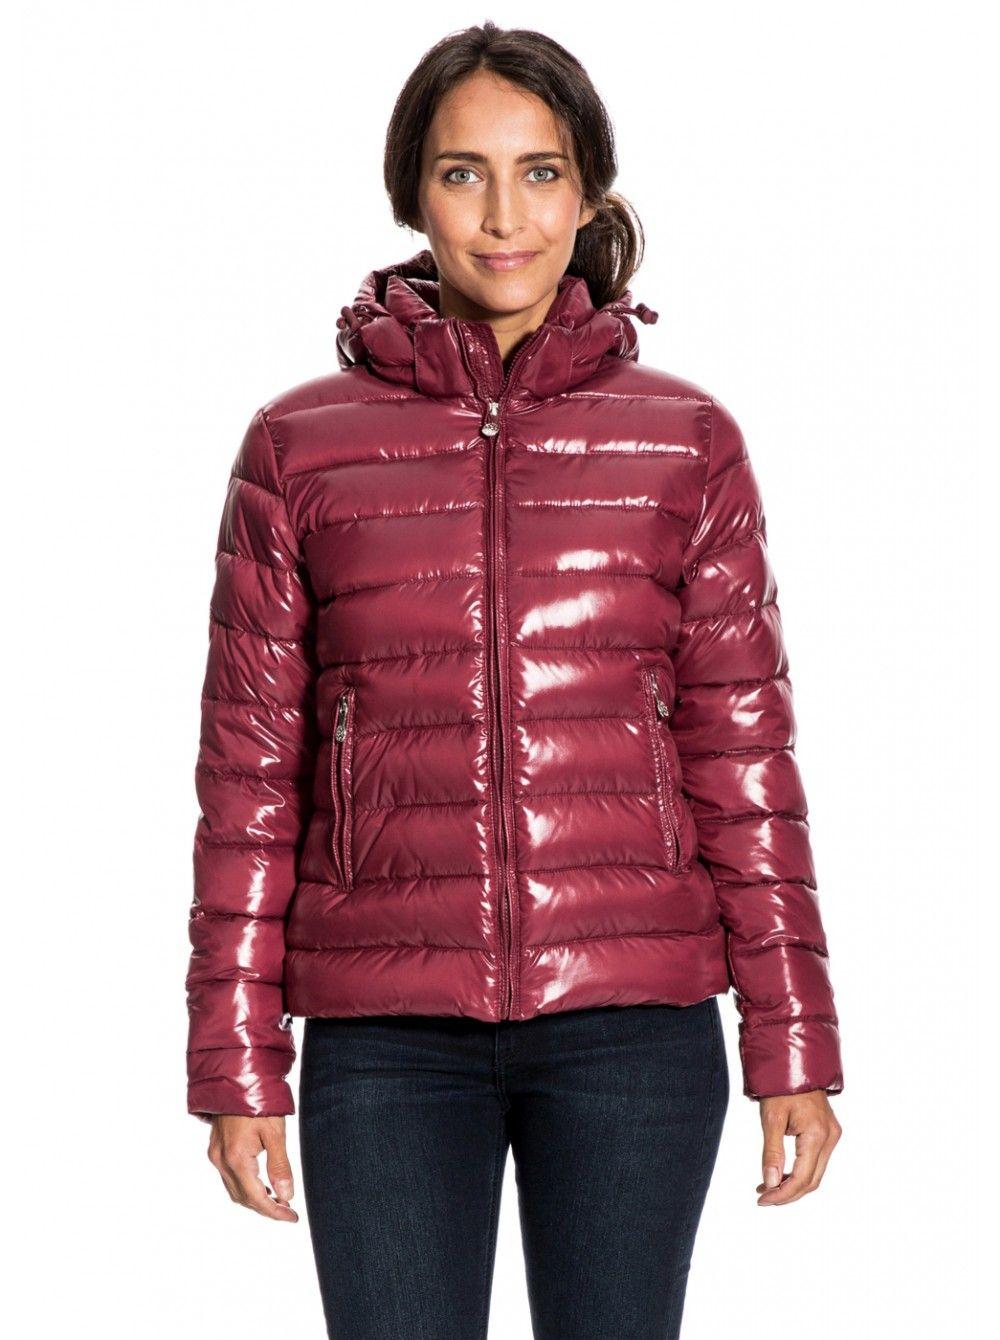 e2feee7a05e doudoune courte WOMEN PIVOINE Spoutnic Jacket Women - PYRENEX ...